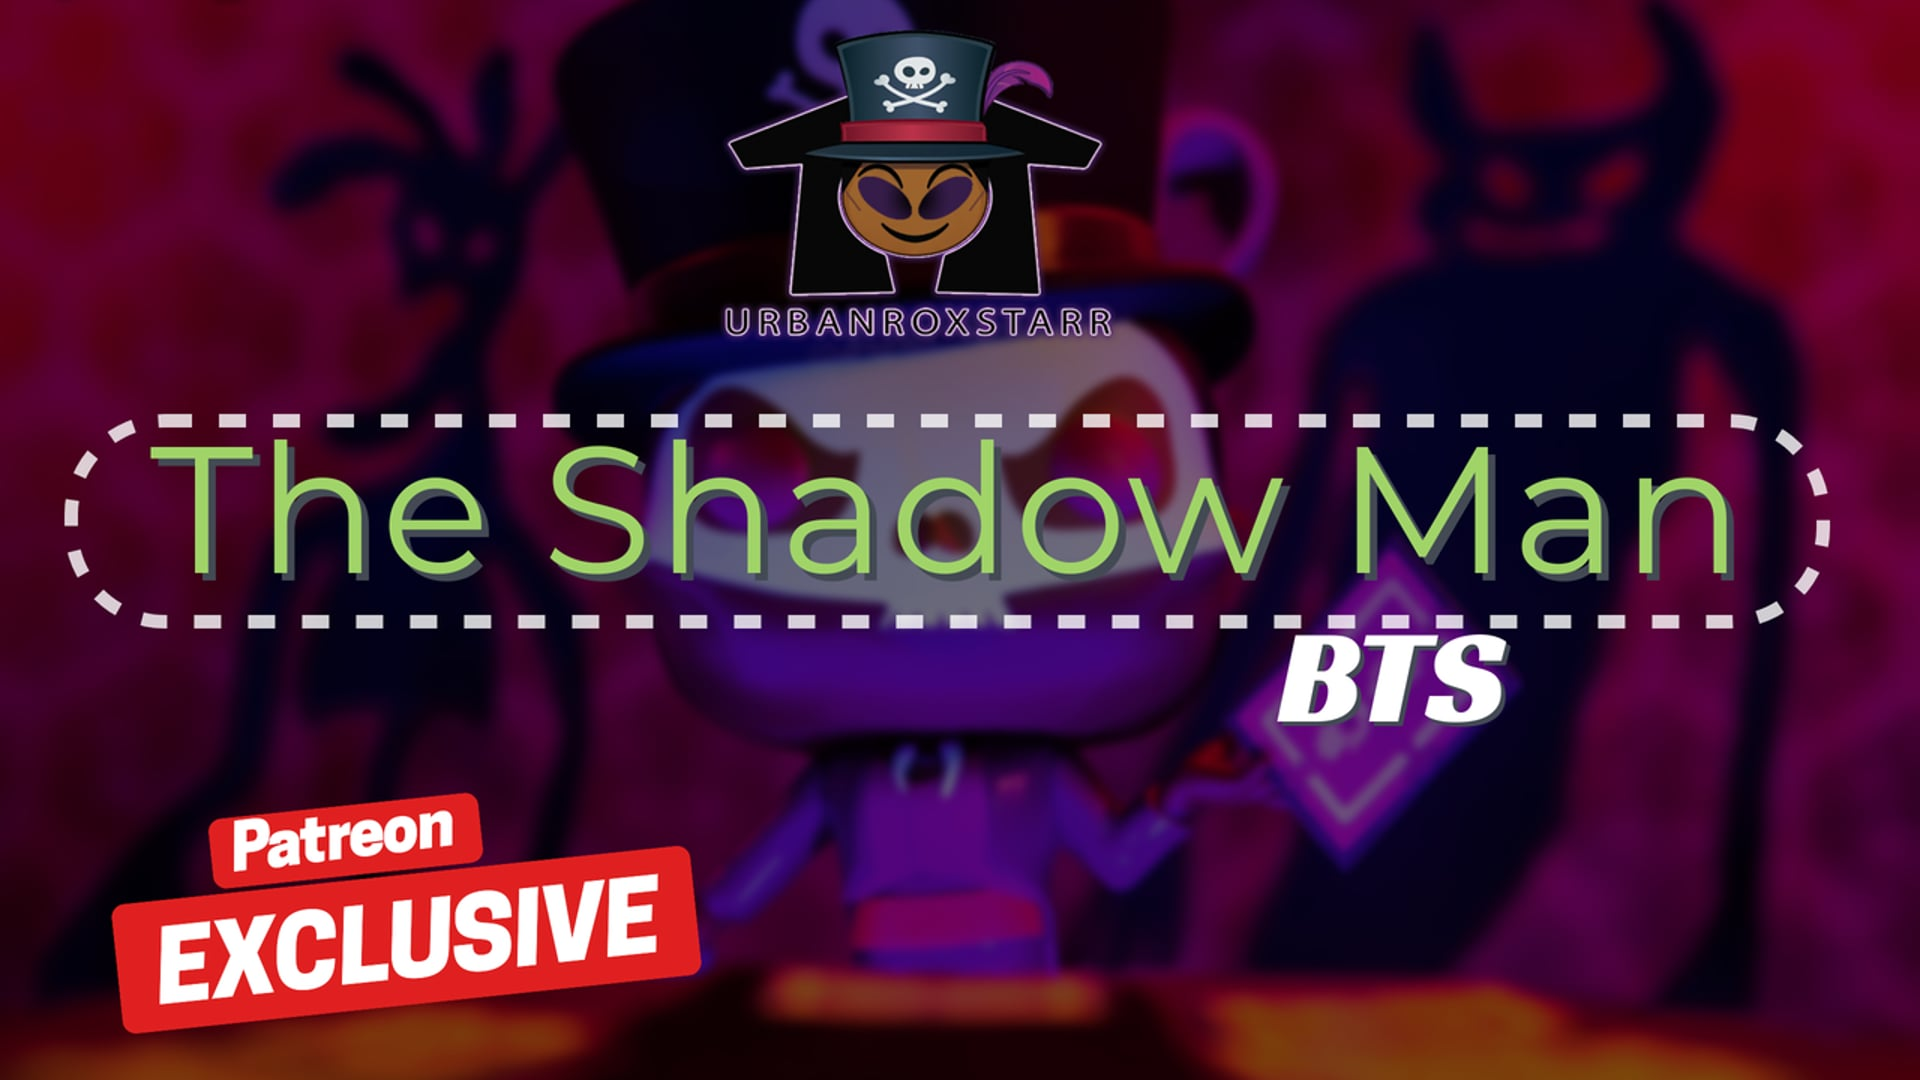 The Shadow Man BTS (LEAK)